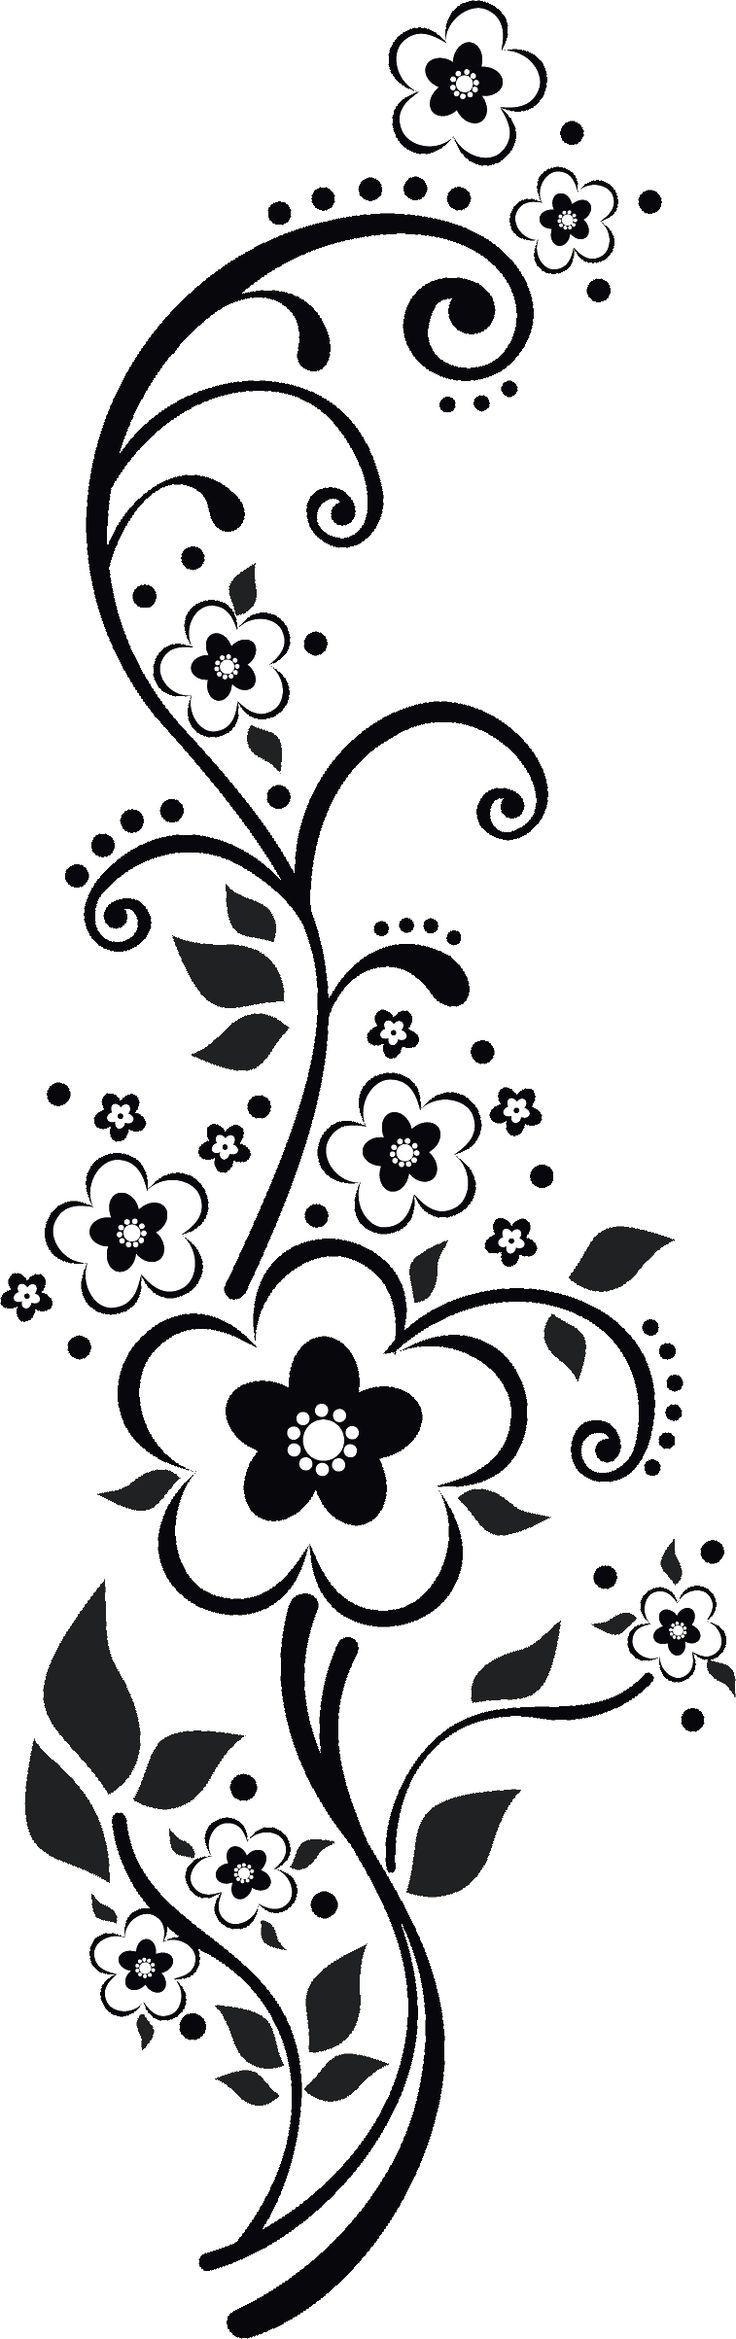 736x2339 Tattoos Vector Graphics